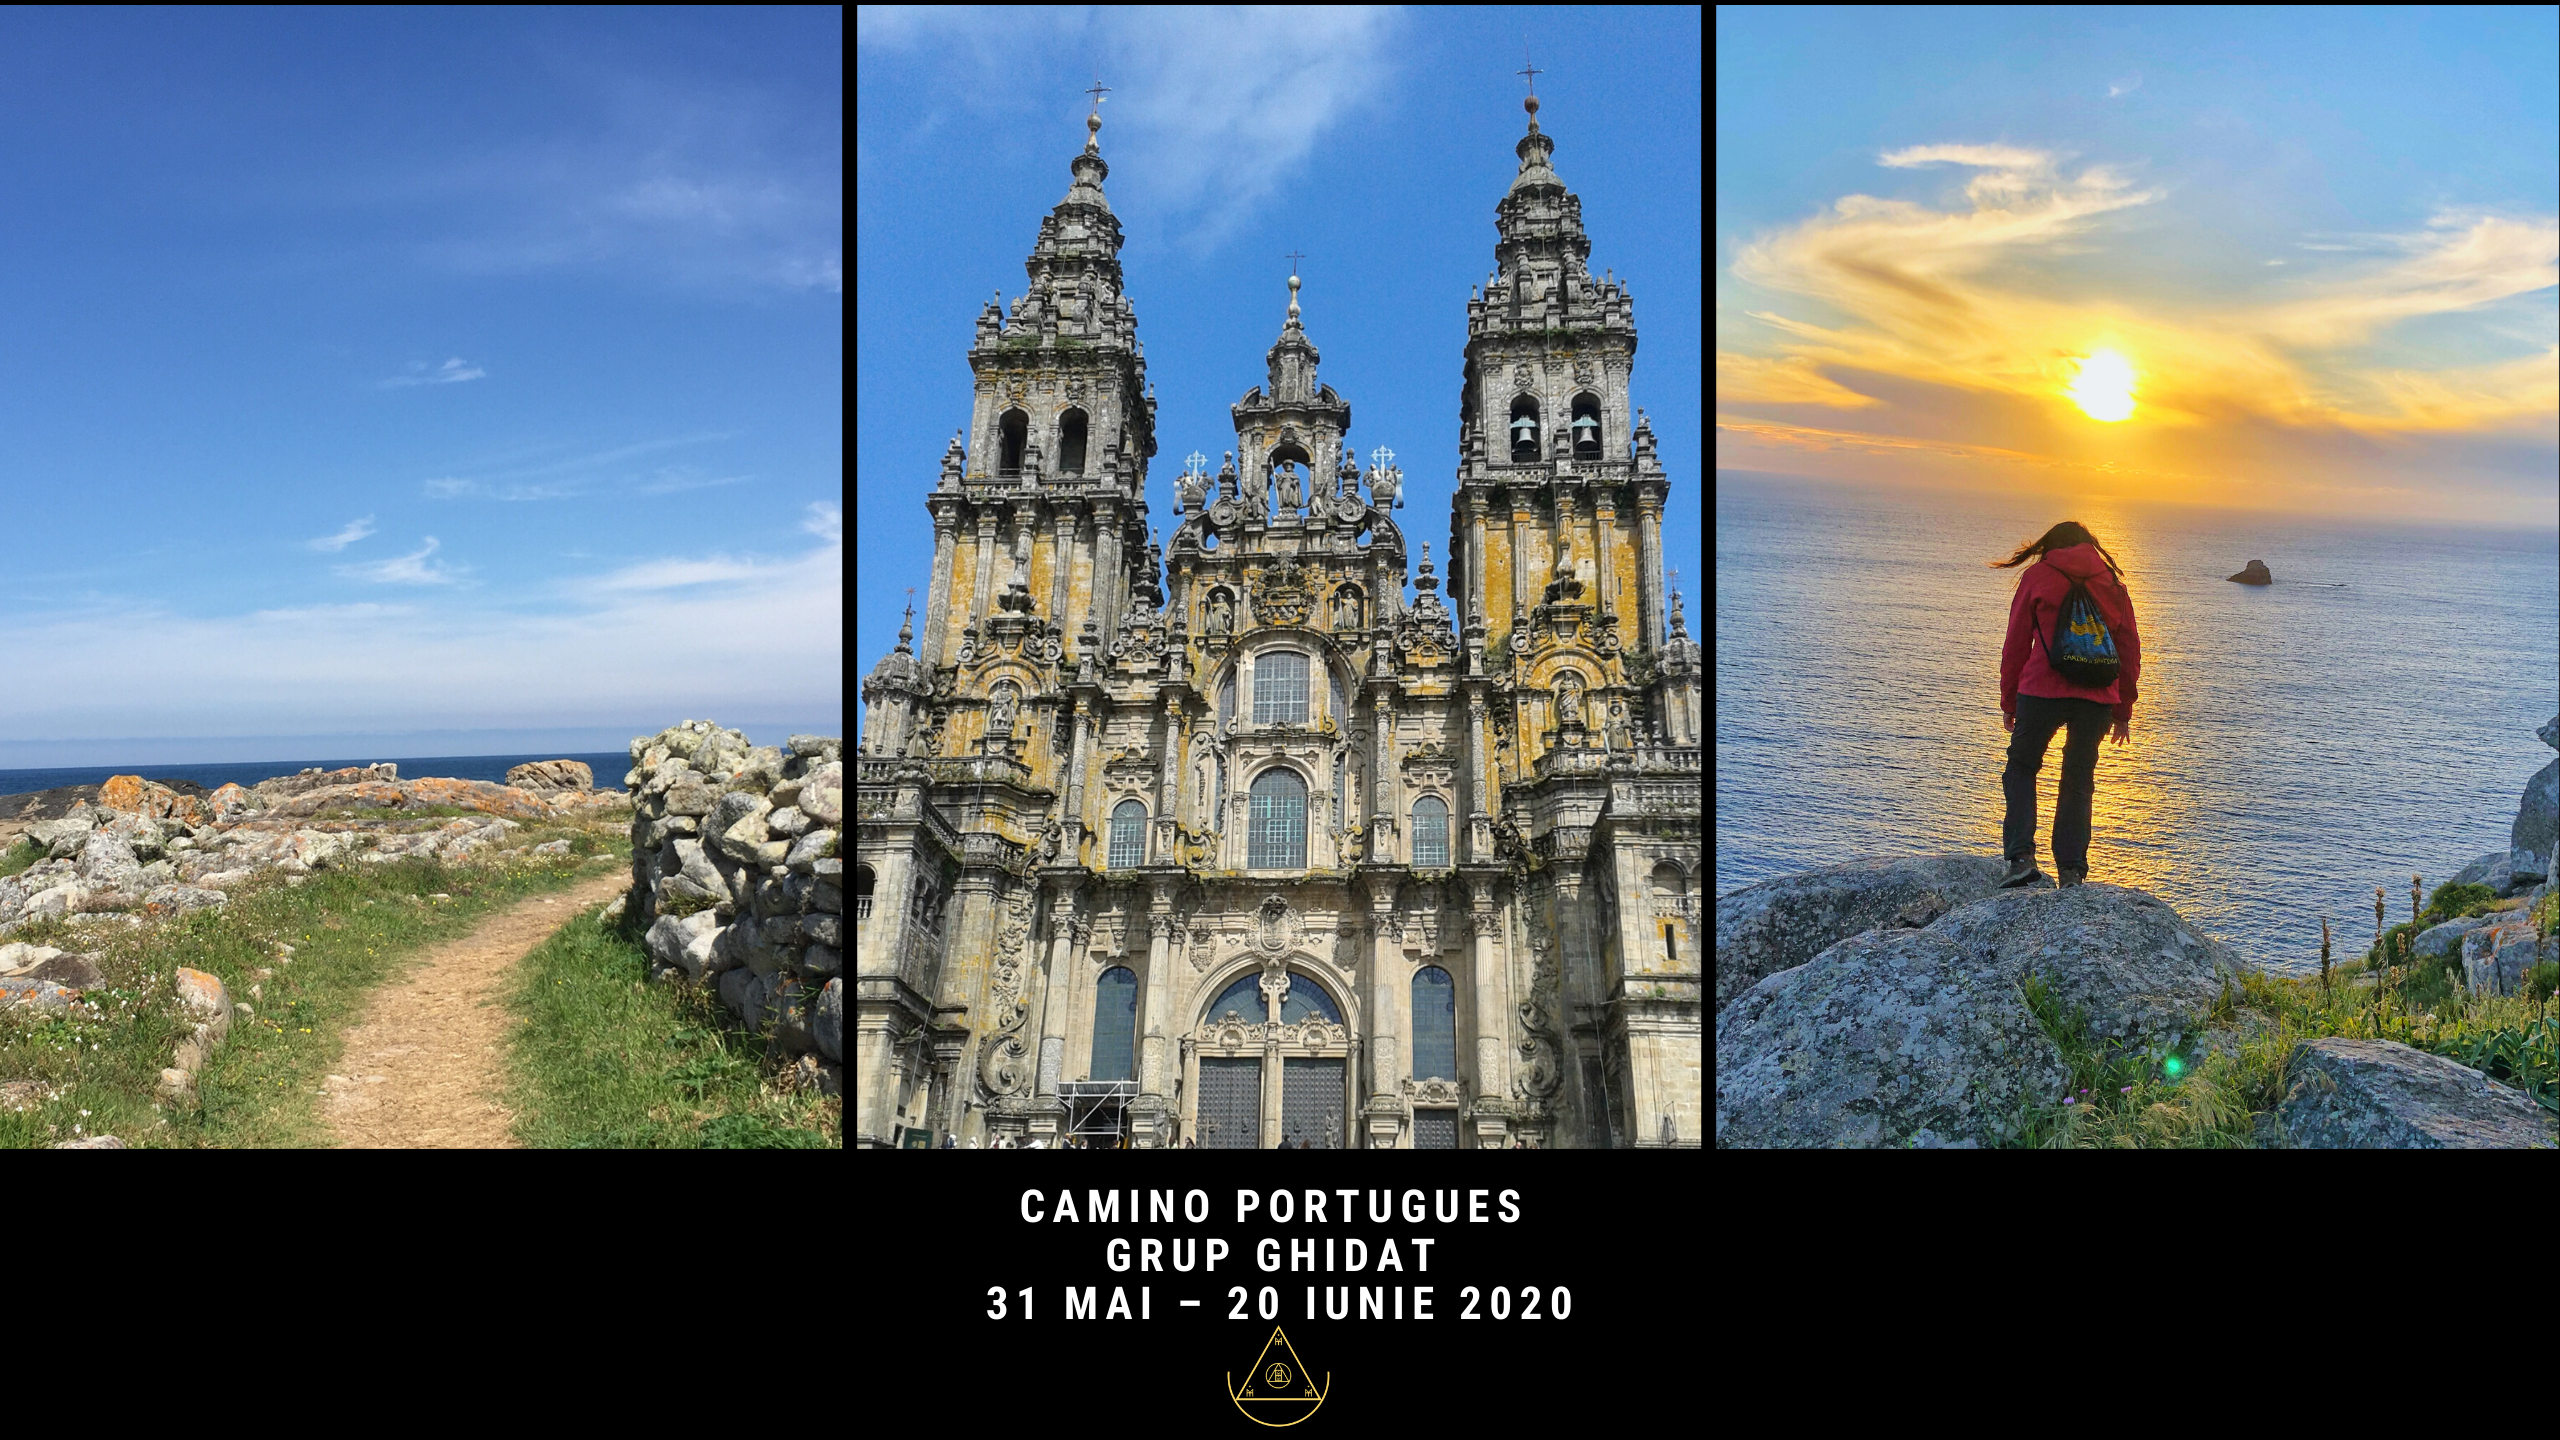 Camino Portugues Grup Ghidat 2020